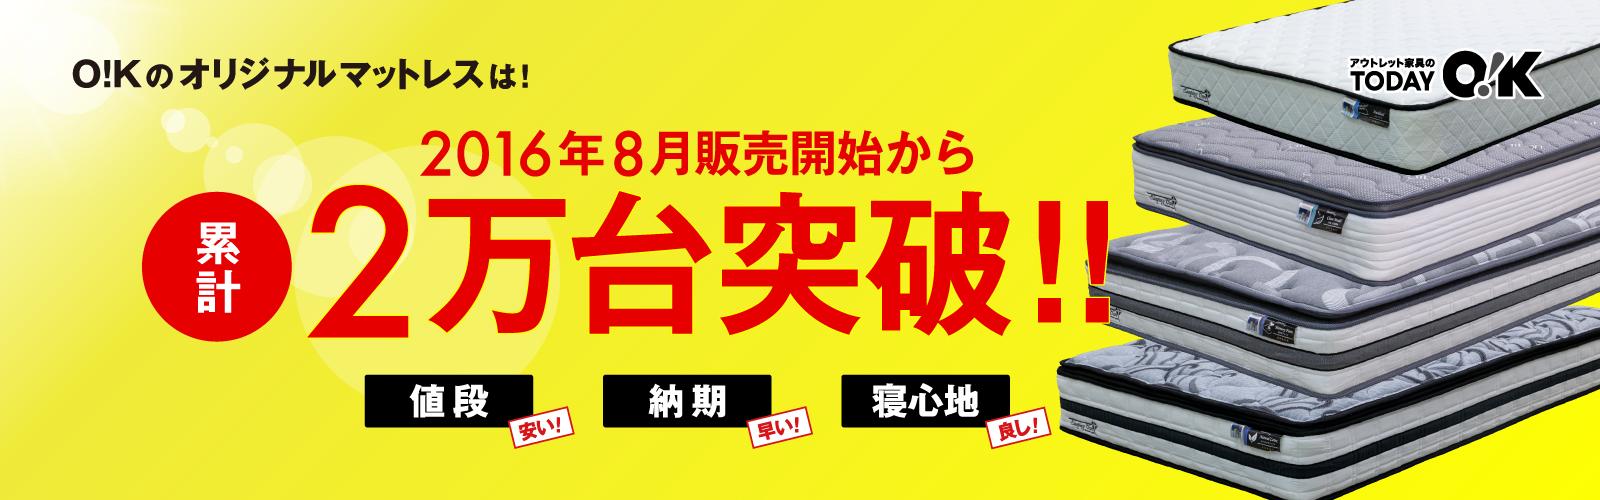 TODAY O!Kオリジナルマットレス累計販売台数2万台突破!